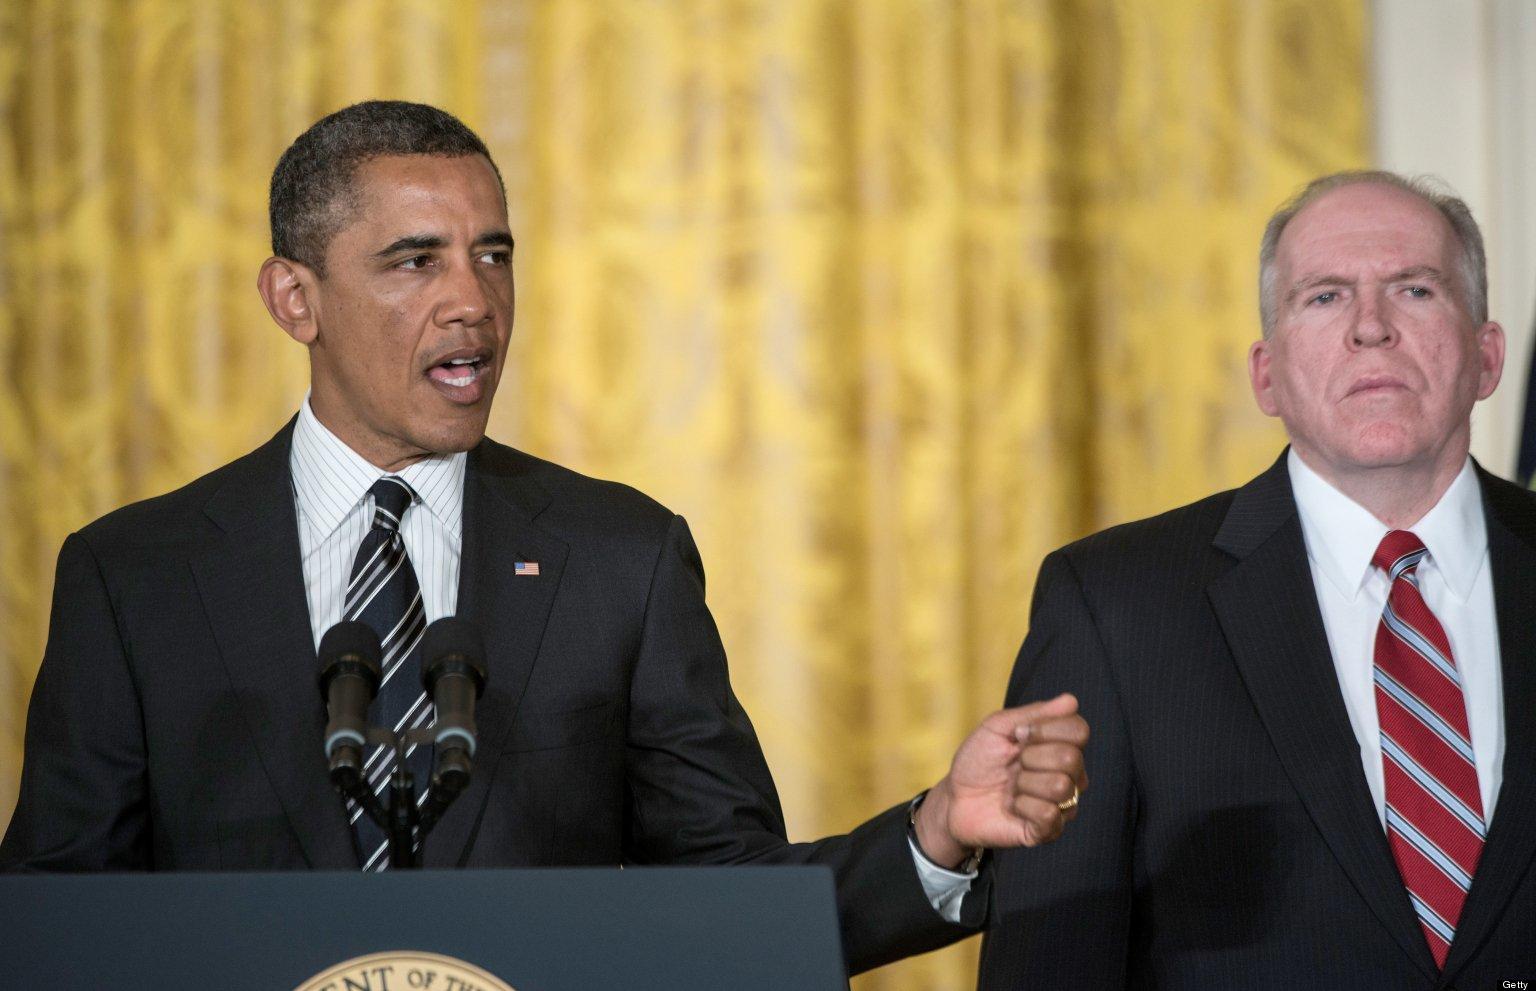 REPORT Former FBI Asst Director Suggests Obama Brennan Committed Felonies Not Flynn VIDEO